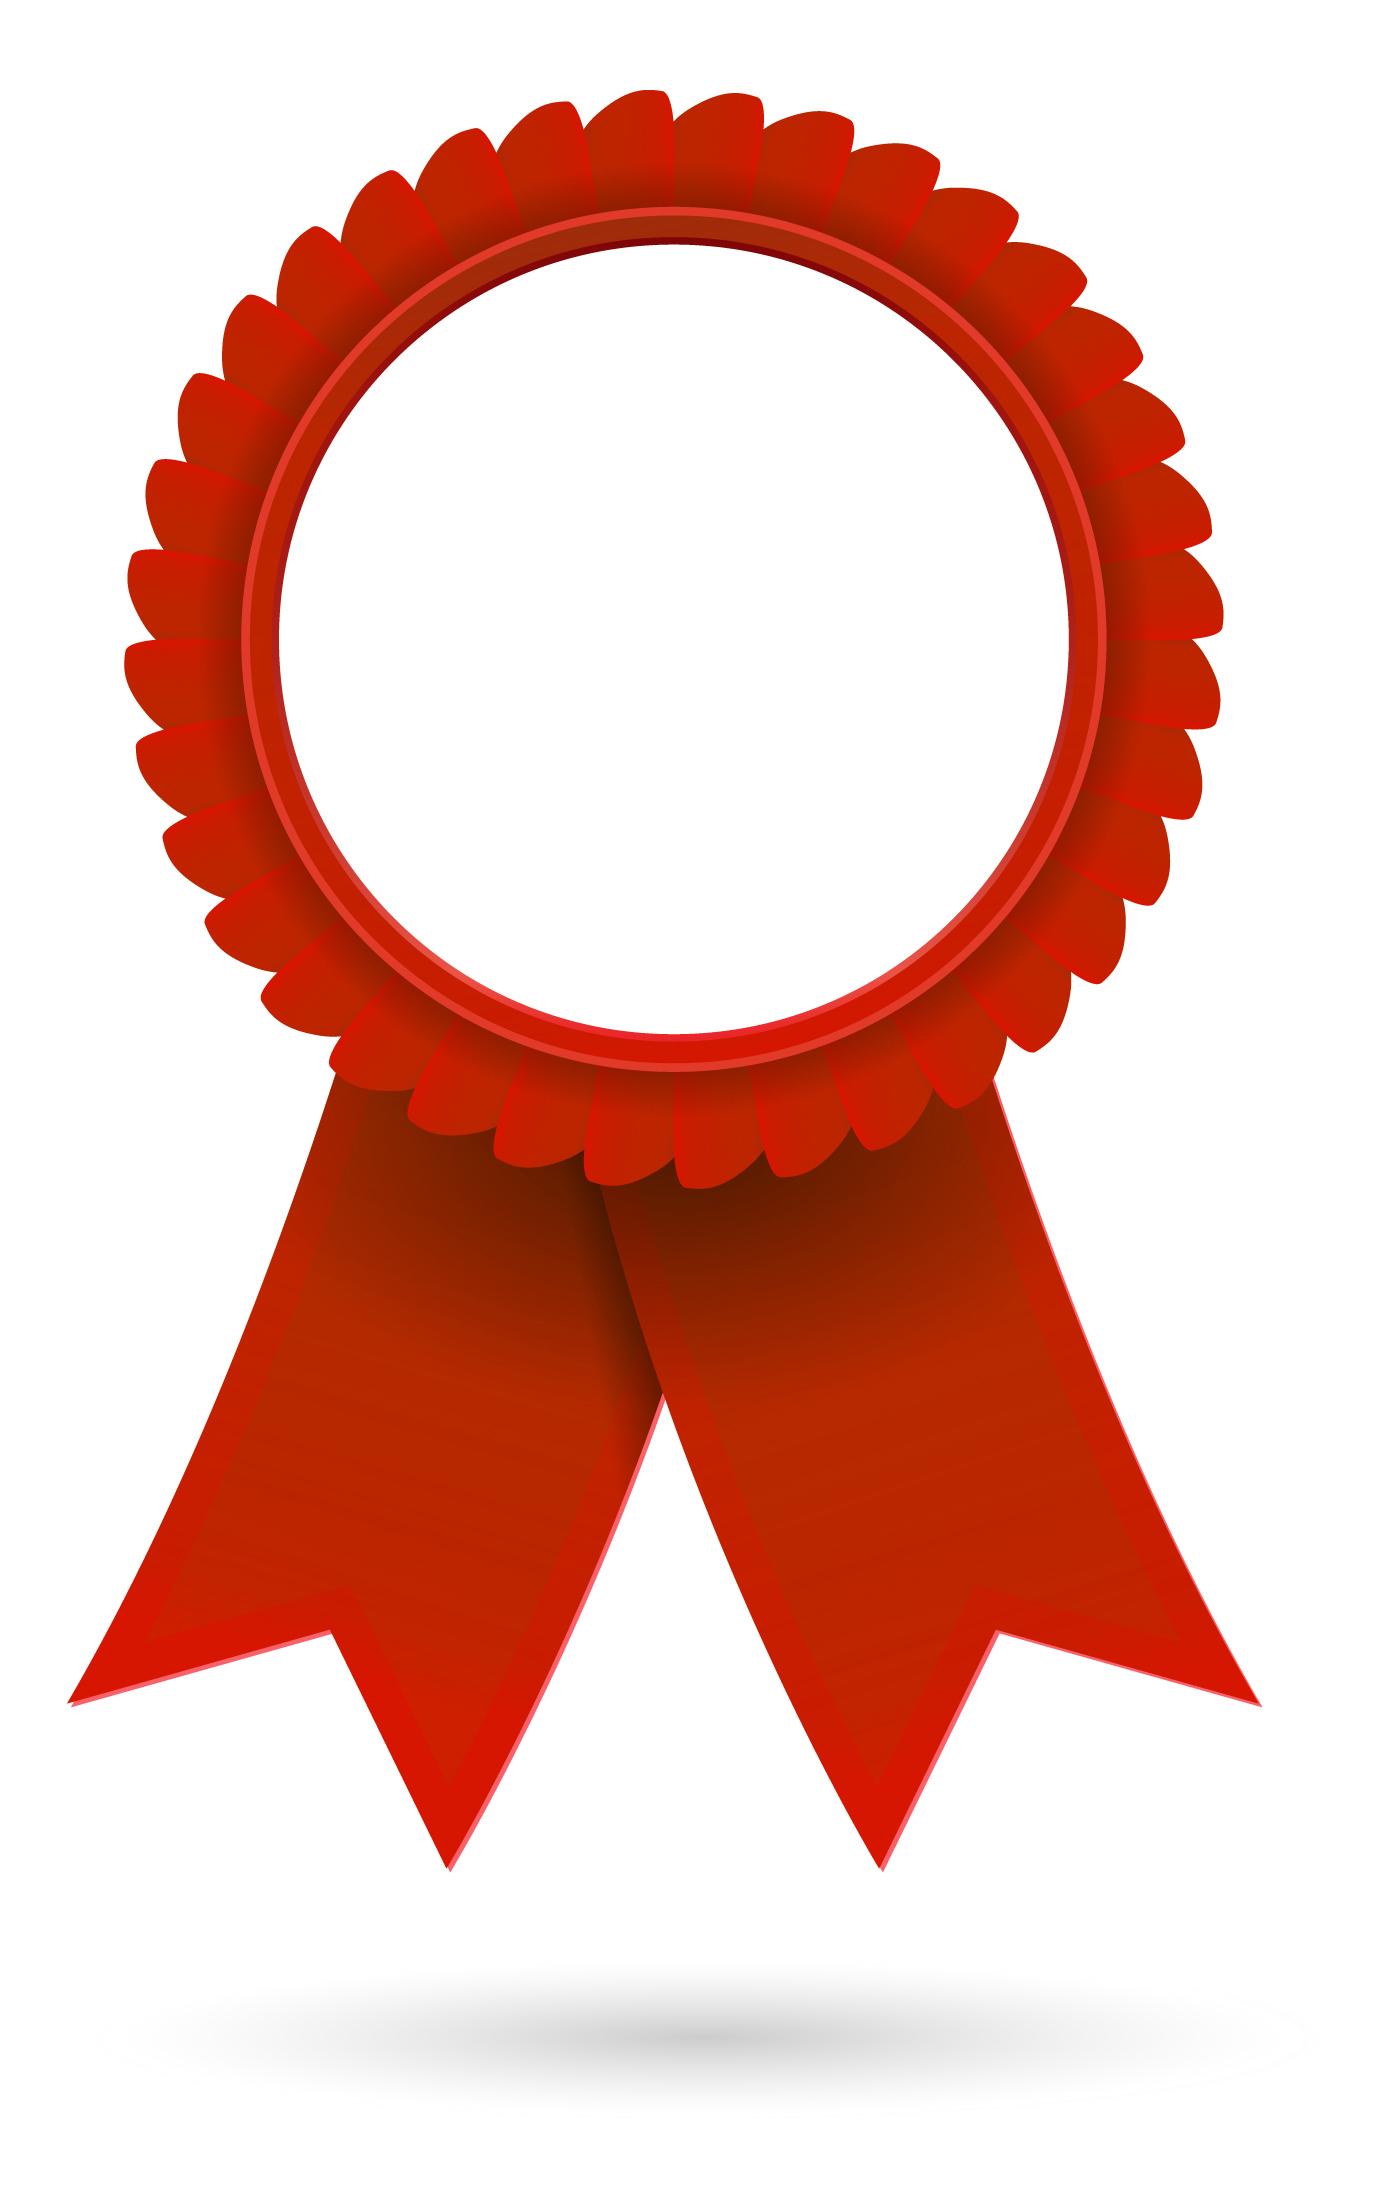 Great job award clipart image